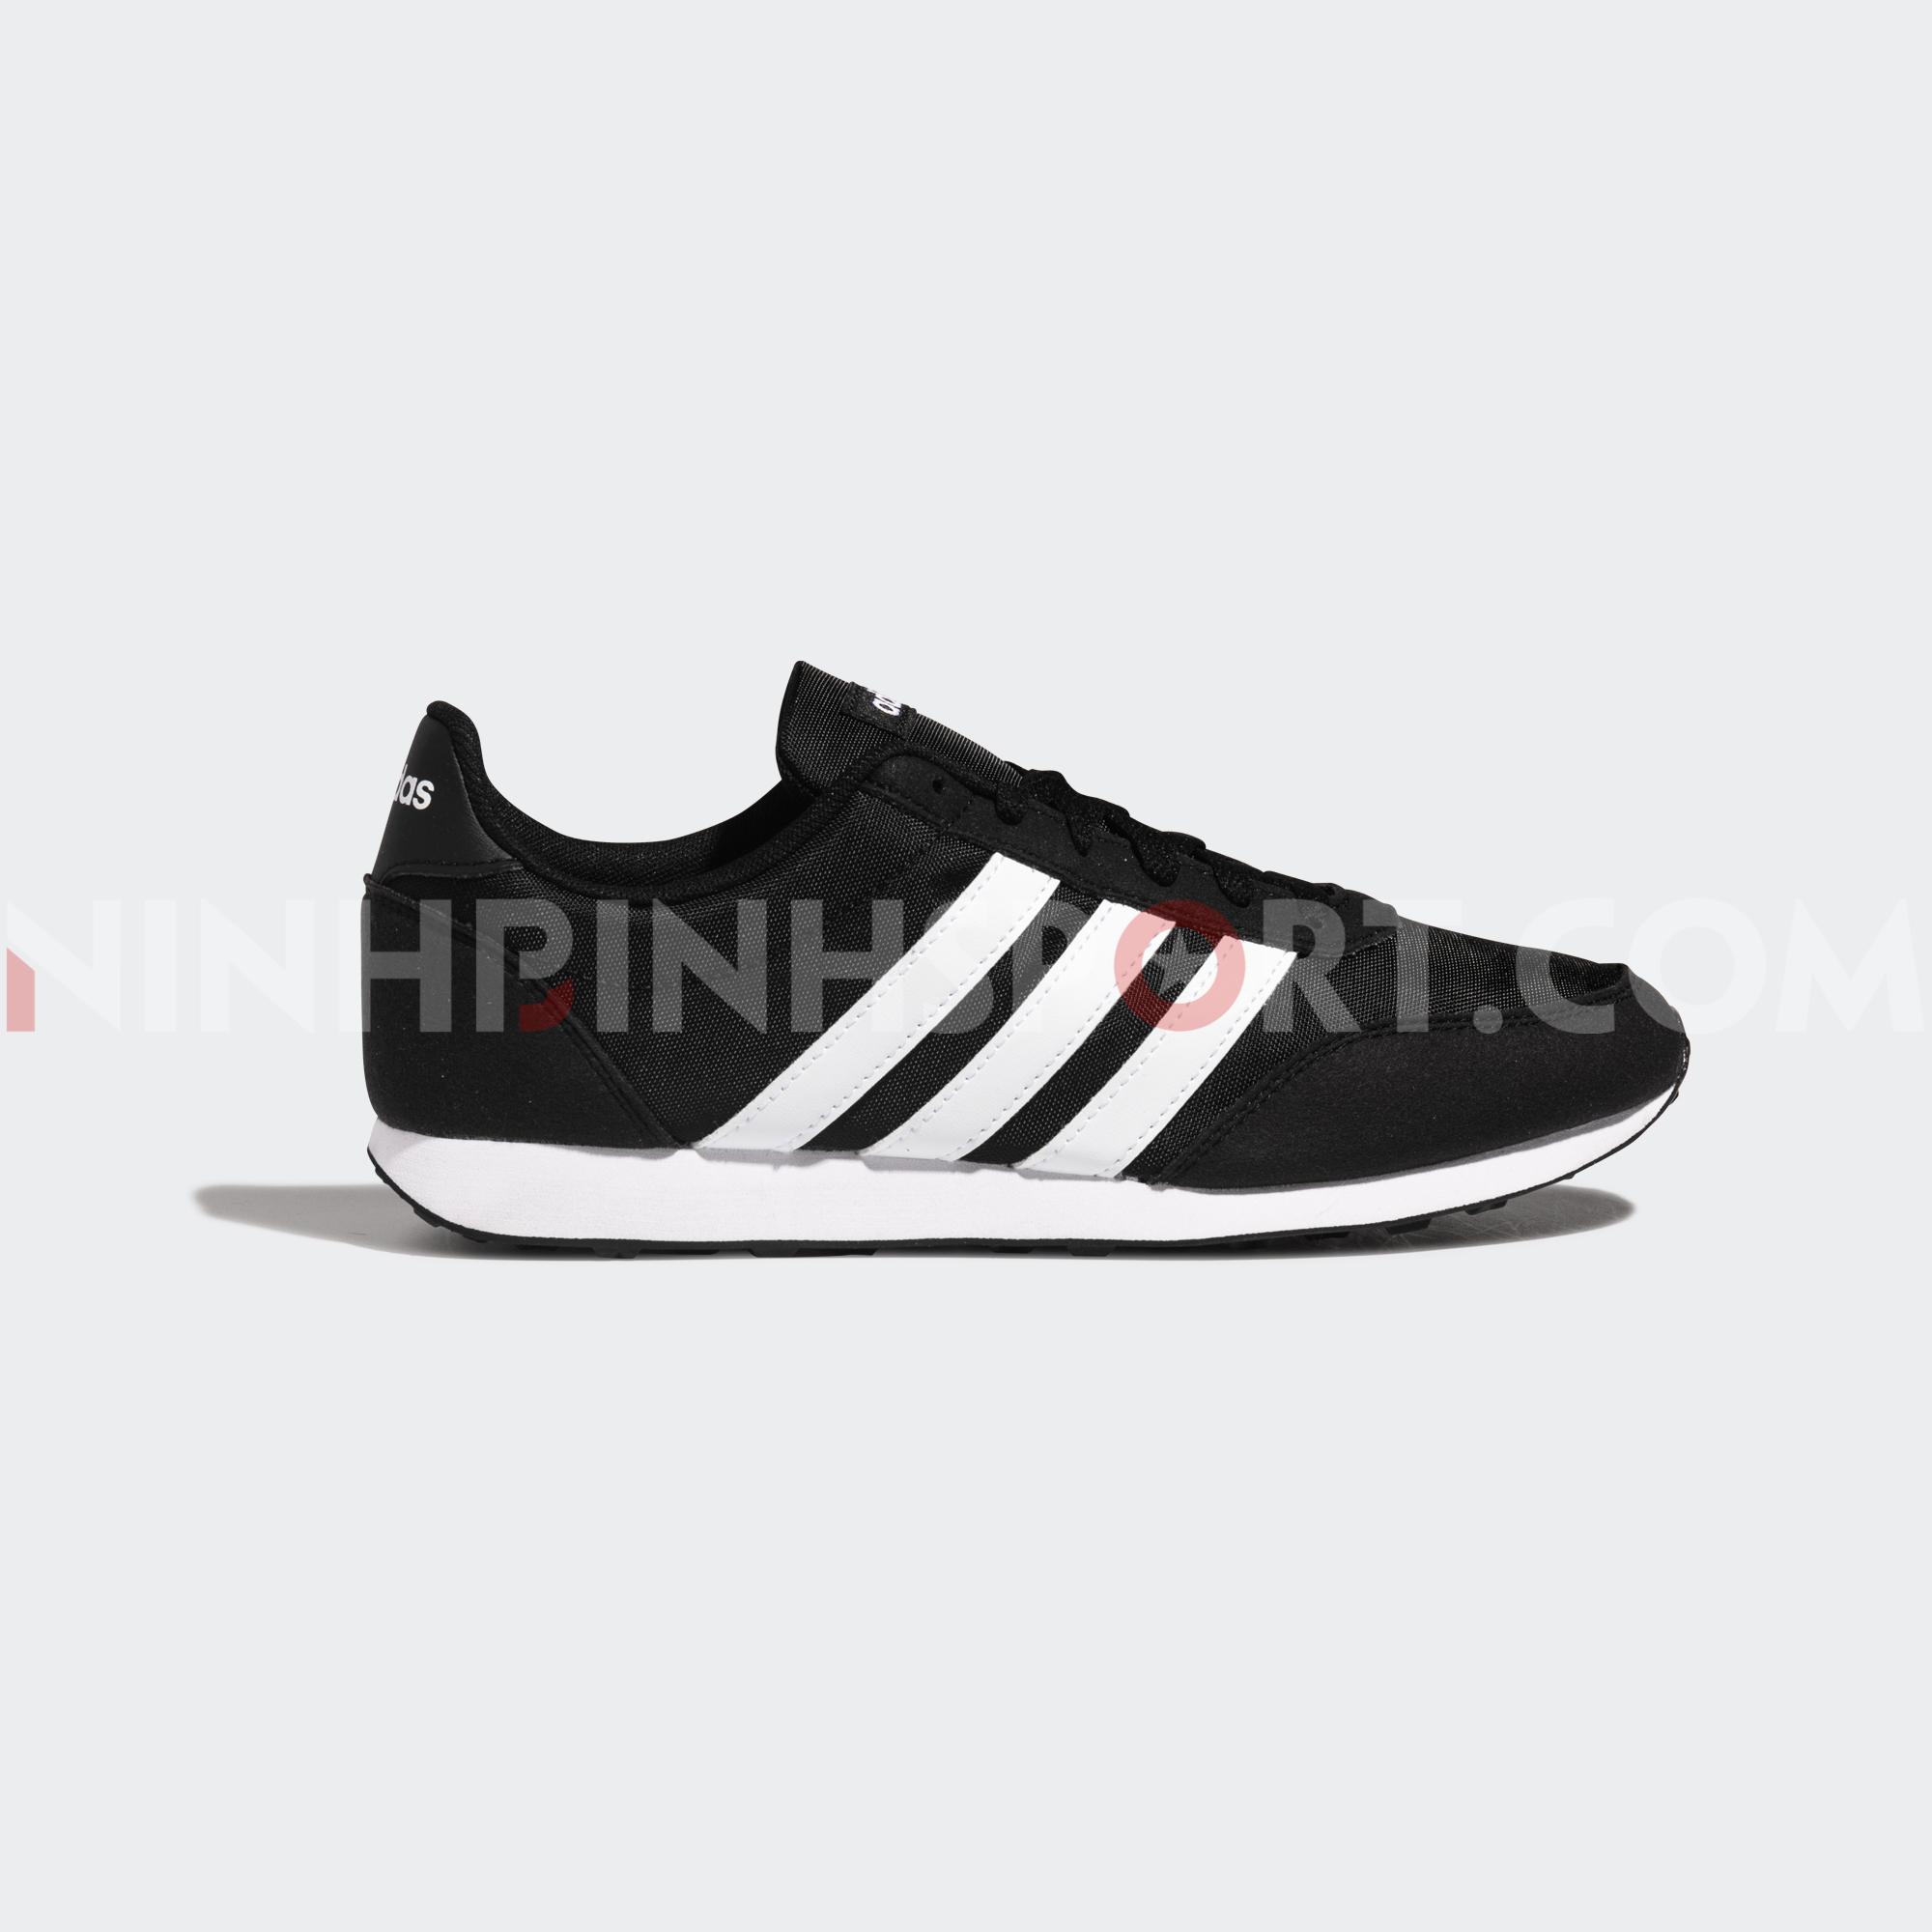 Giày thể thao nam Adidas Neo V Racer 2.0 Black - EE6405